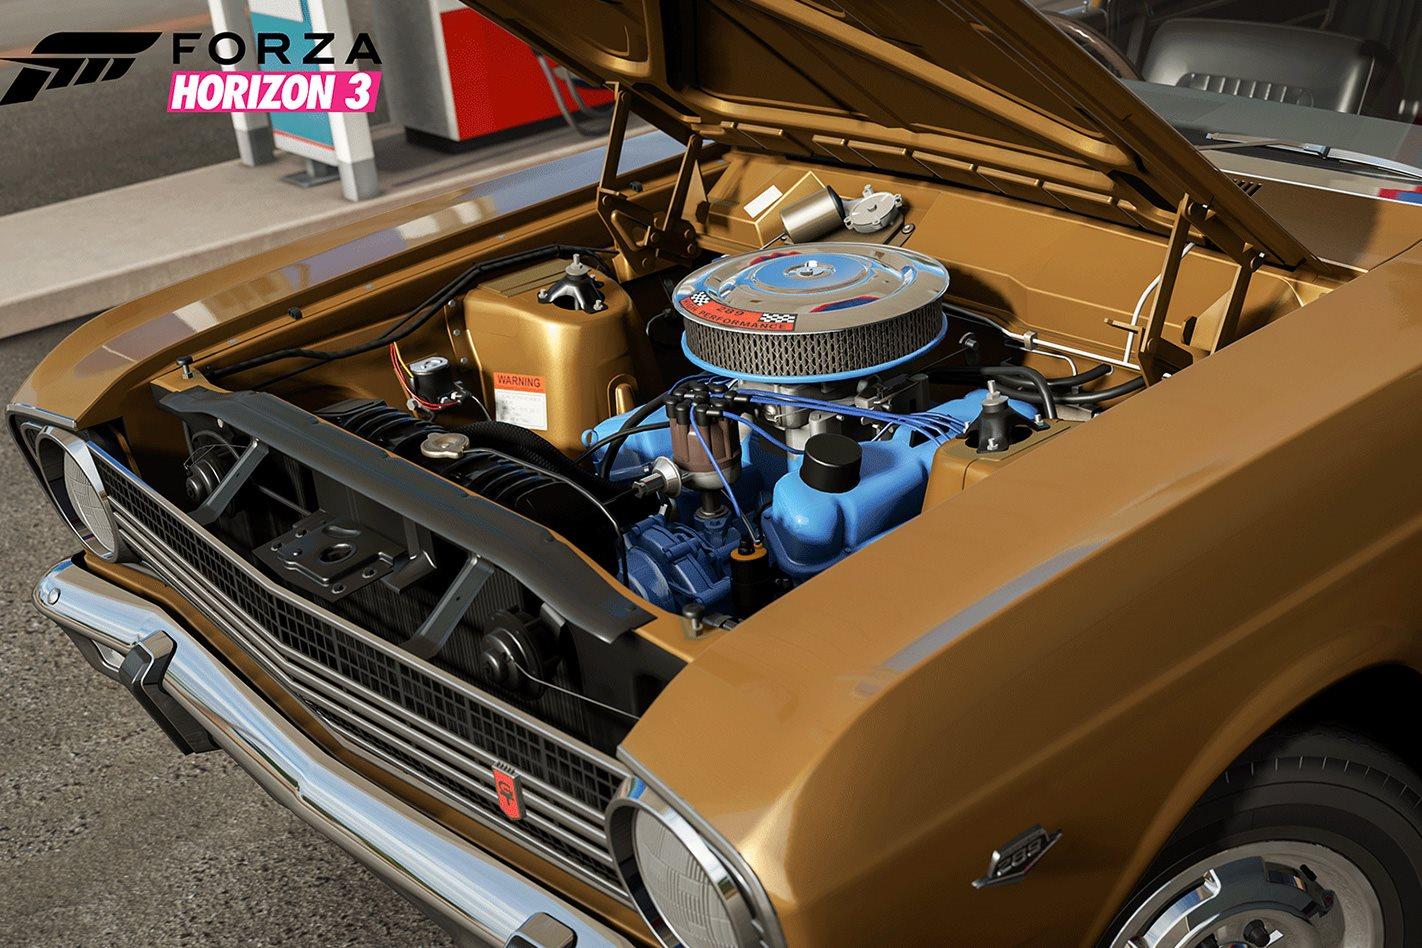 Ford Falcon engine Forza Motorsport 7